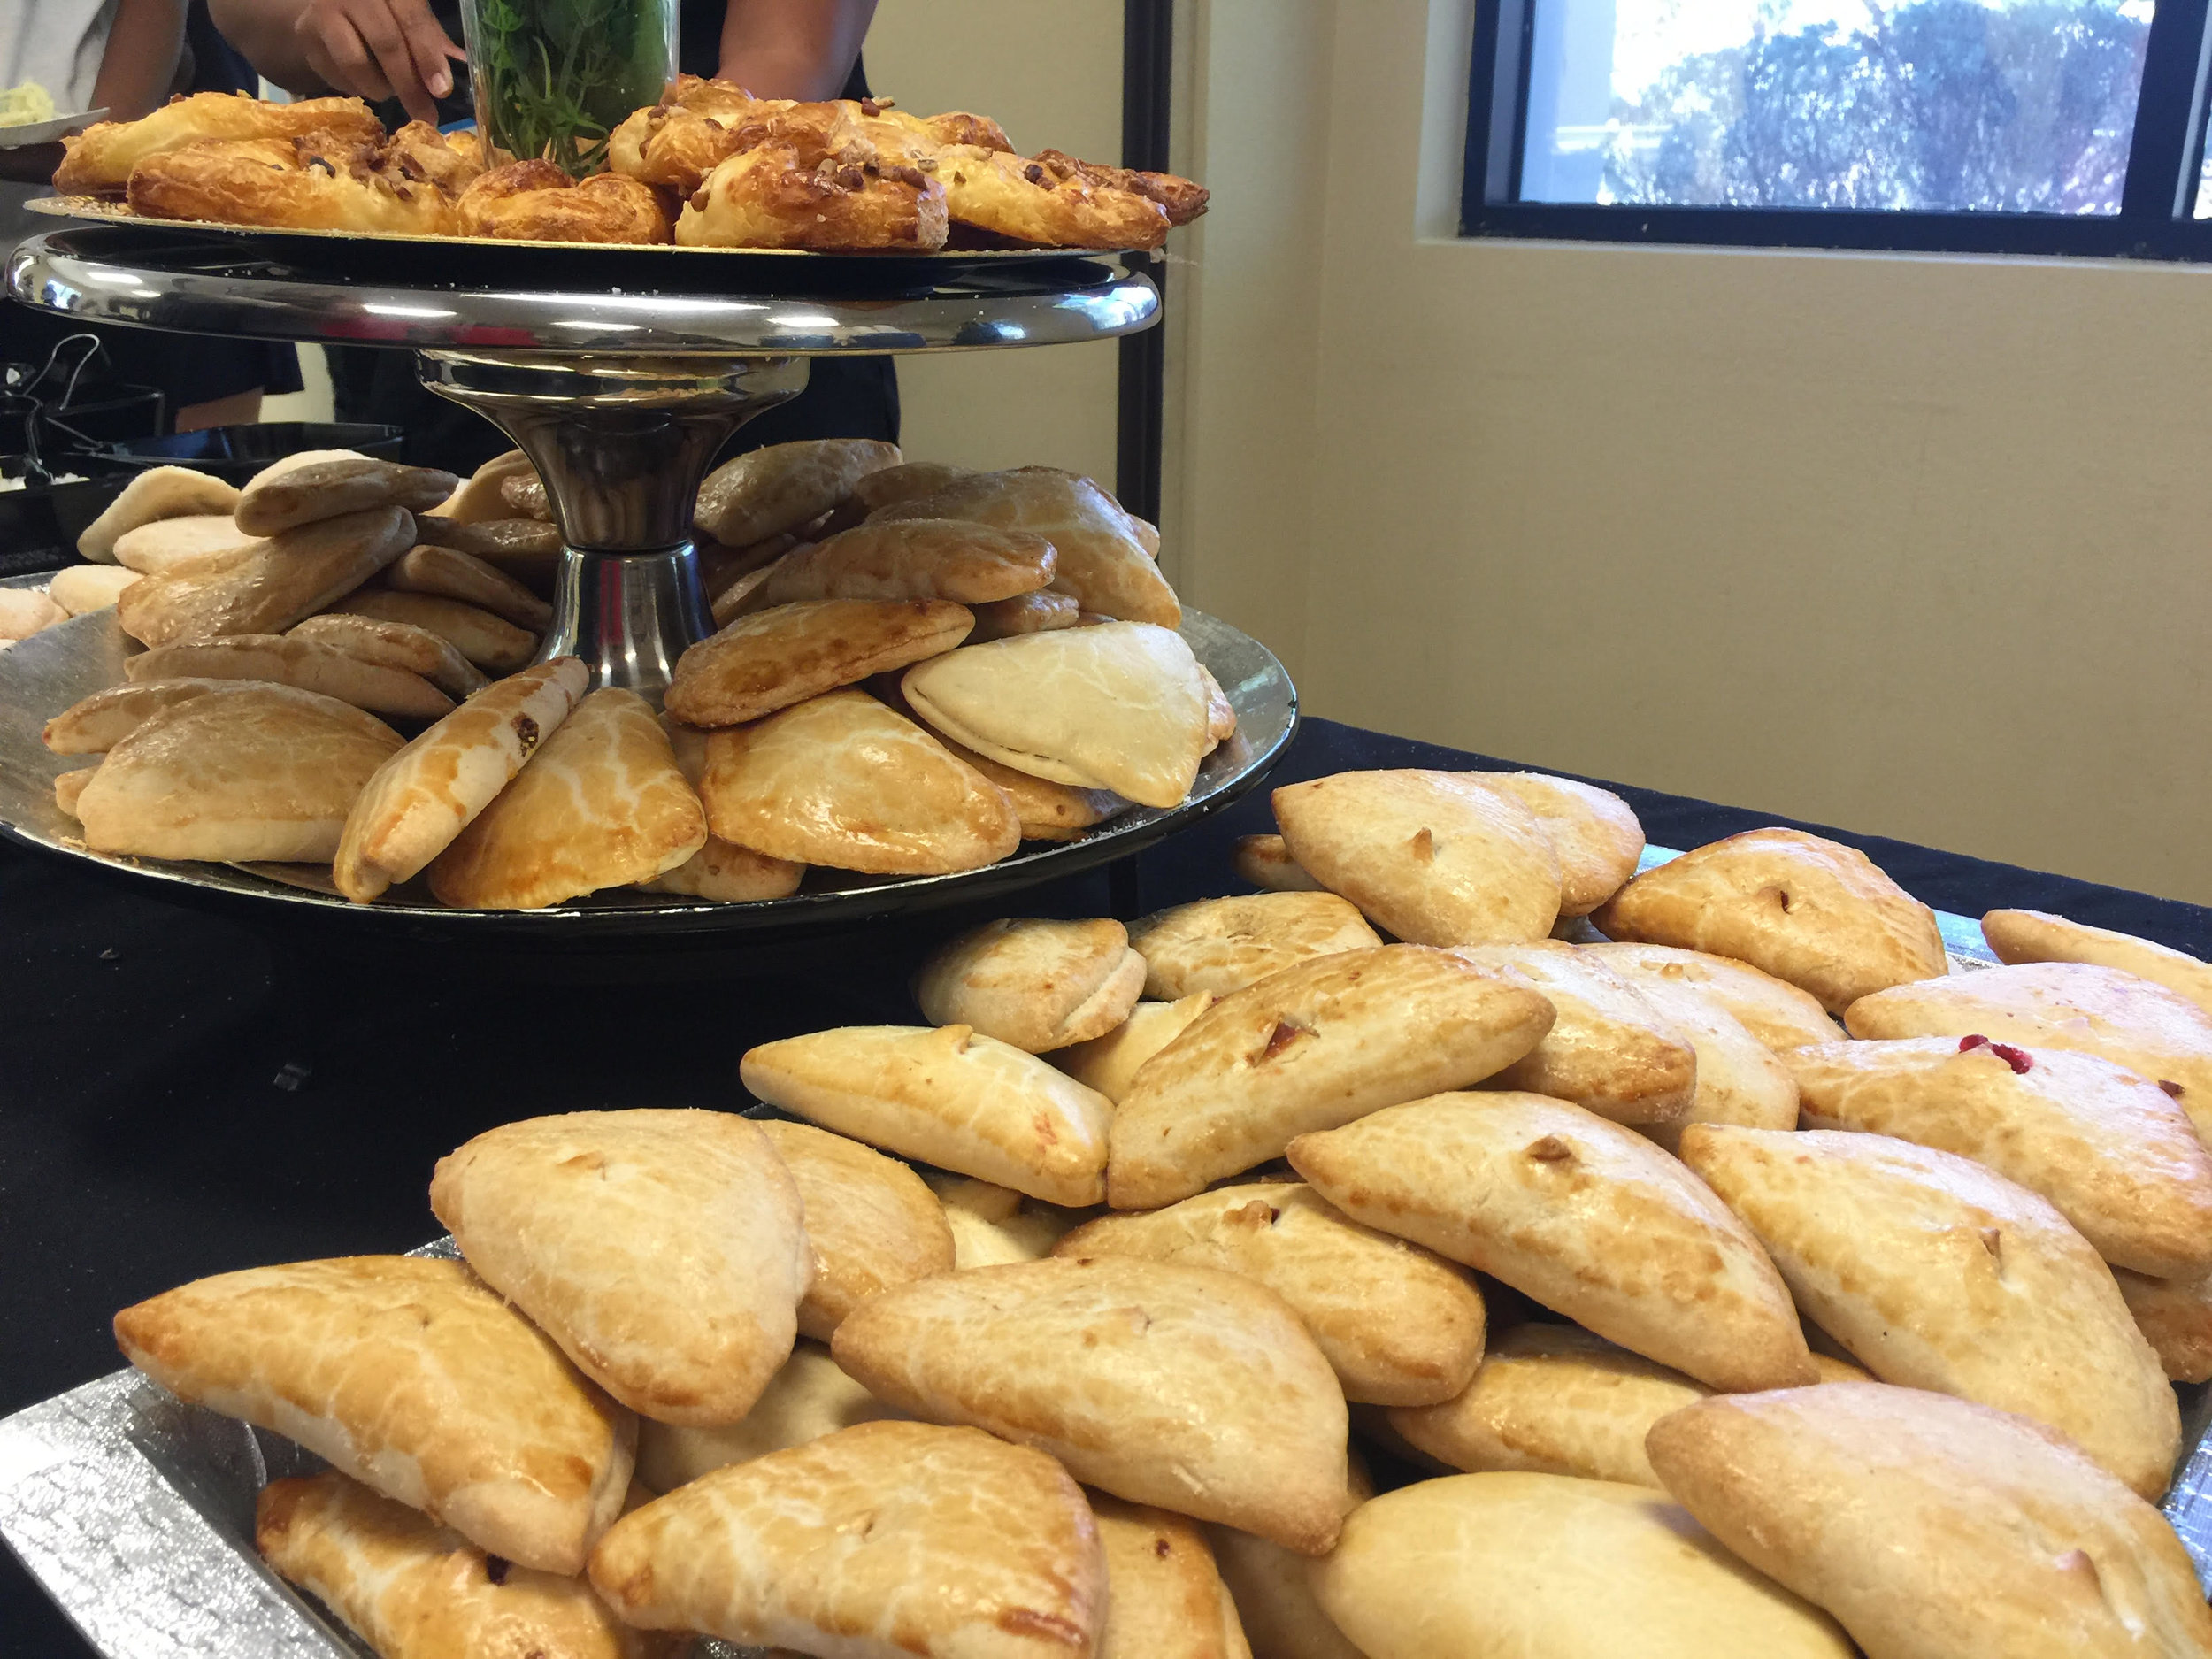 Empanadas (Turnovers) for Northwest Career College